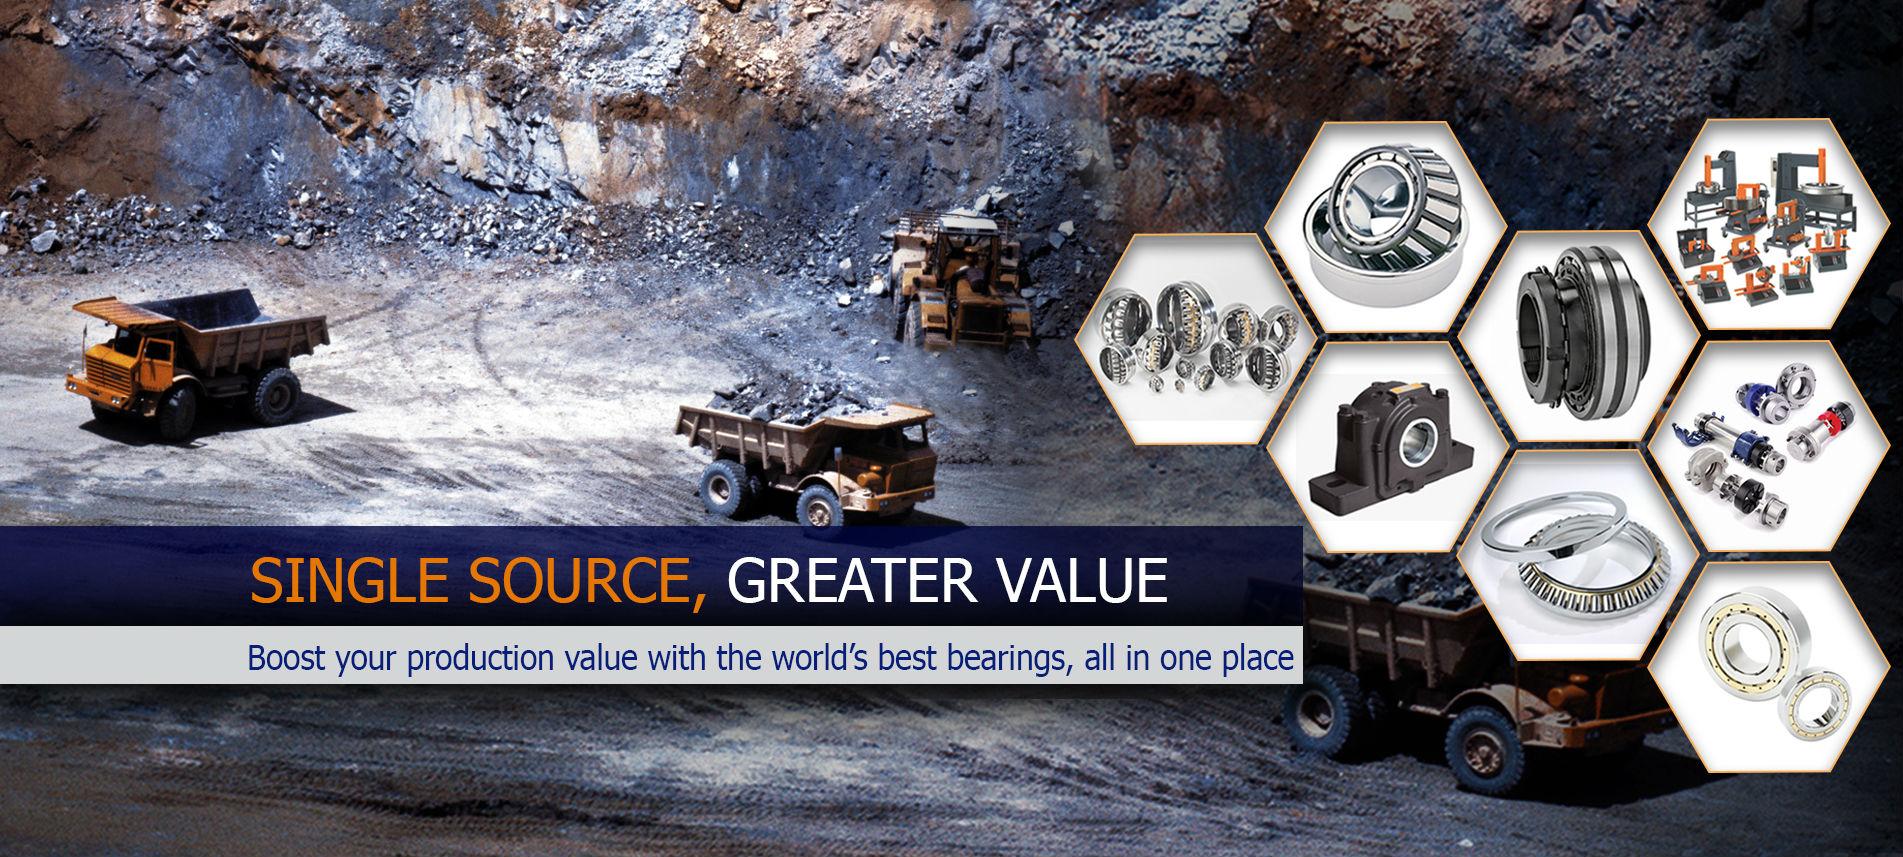 single source grater value